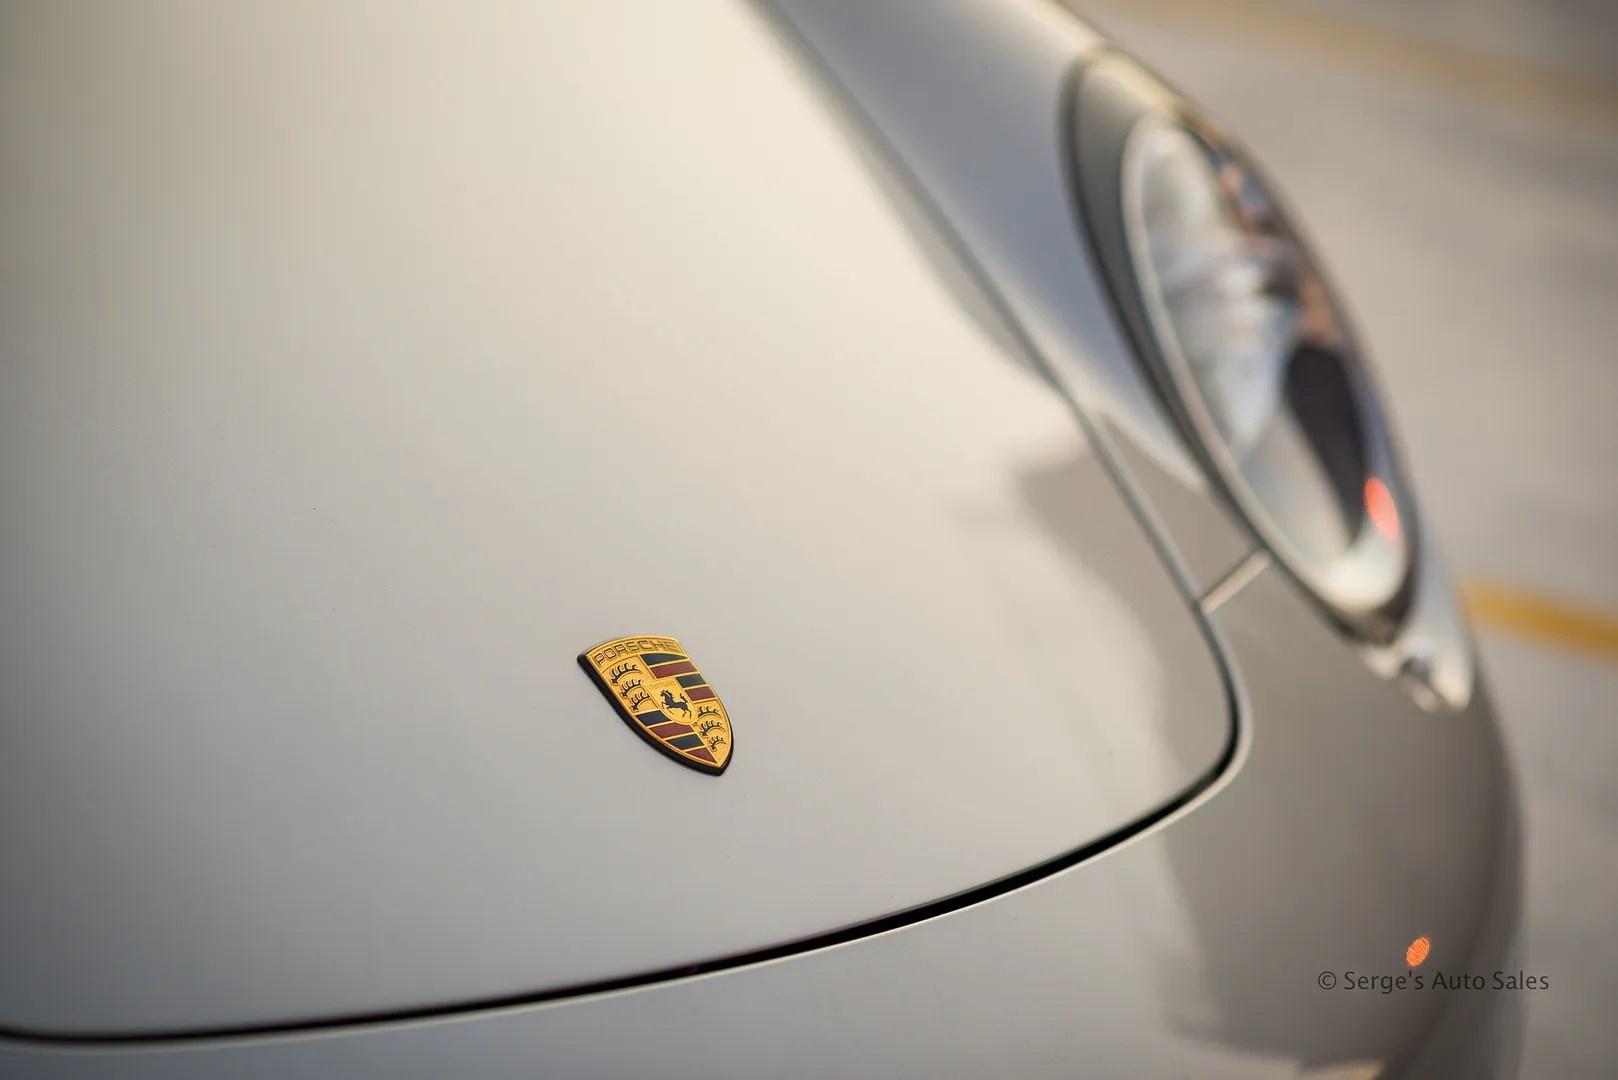 photo Serges-auto-sales-porsche-911-for-sale-scranton-pennsylvania-51_zpsss2vxnpp.jpg